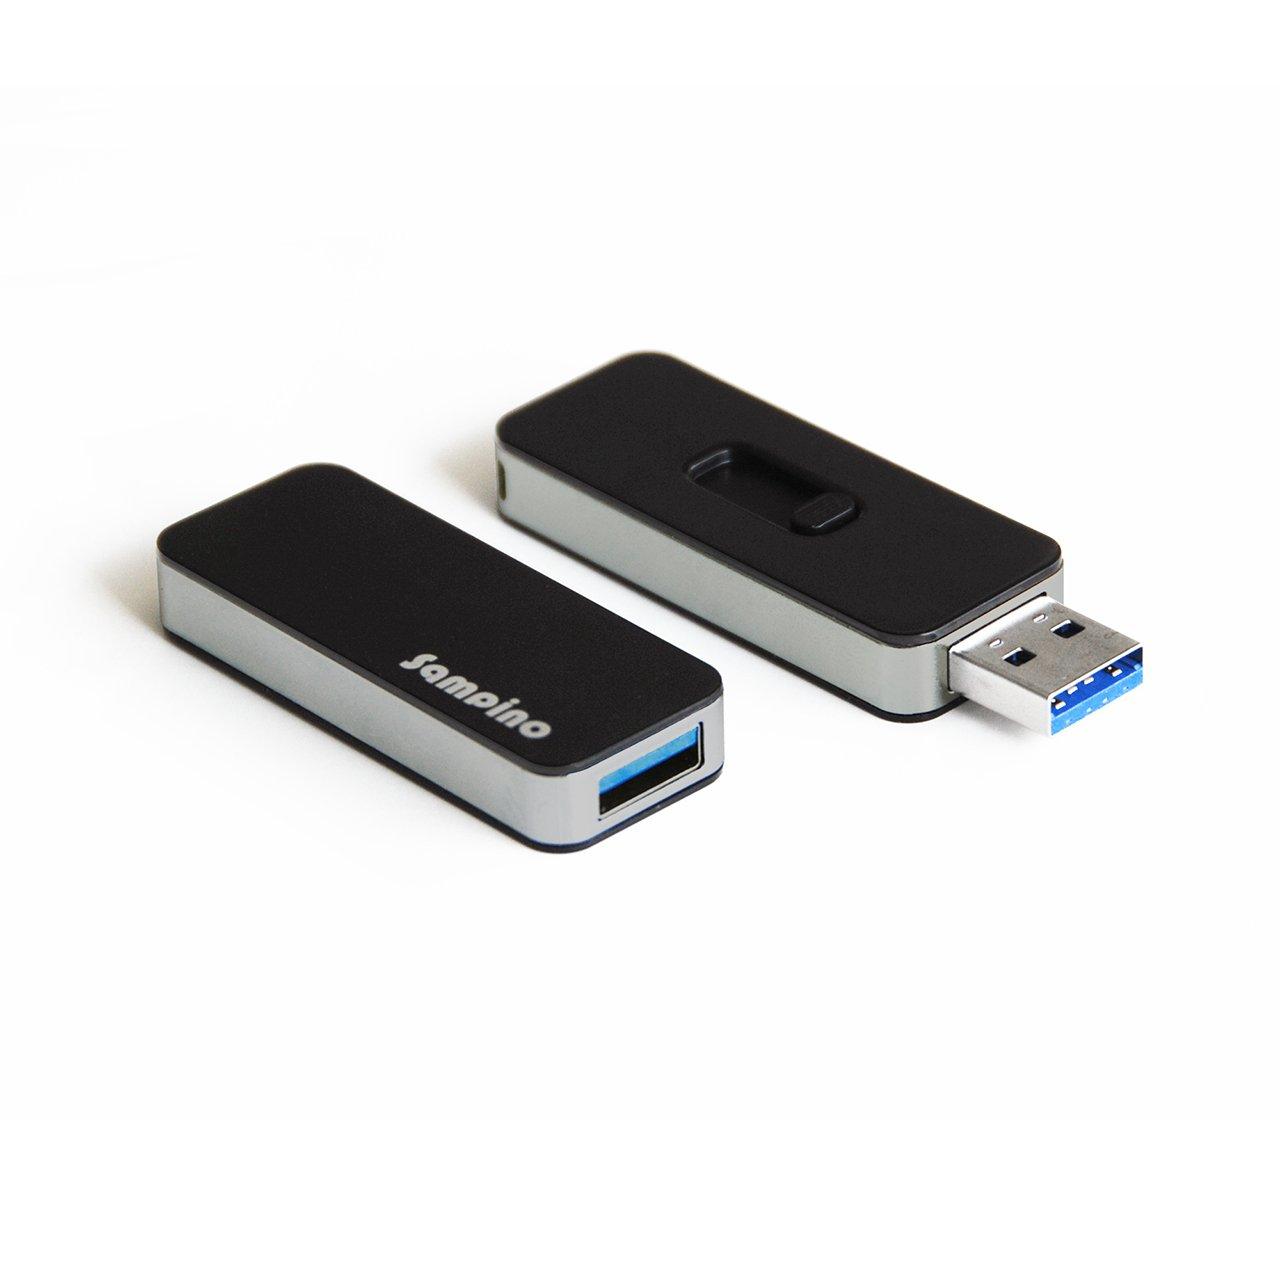 Sampino 16GB USB 3.0 Retractable Capless Flash Drive,Compatible for Windows 8, 7, Vista, XP, Mac (Black)